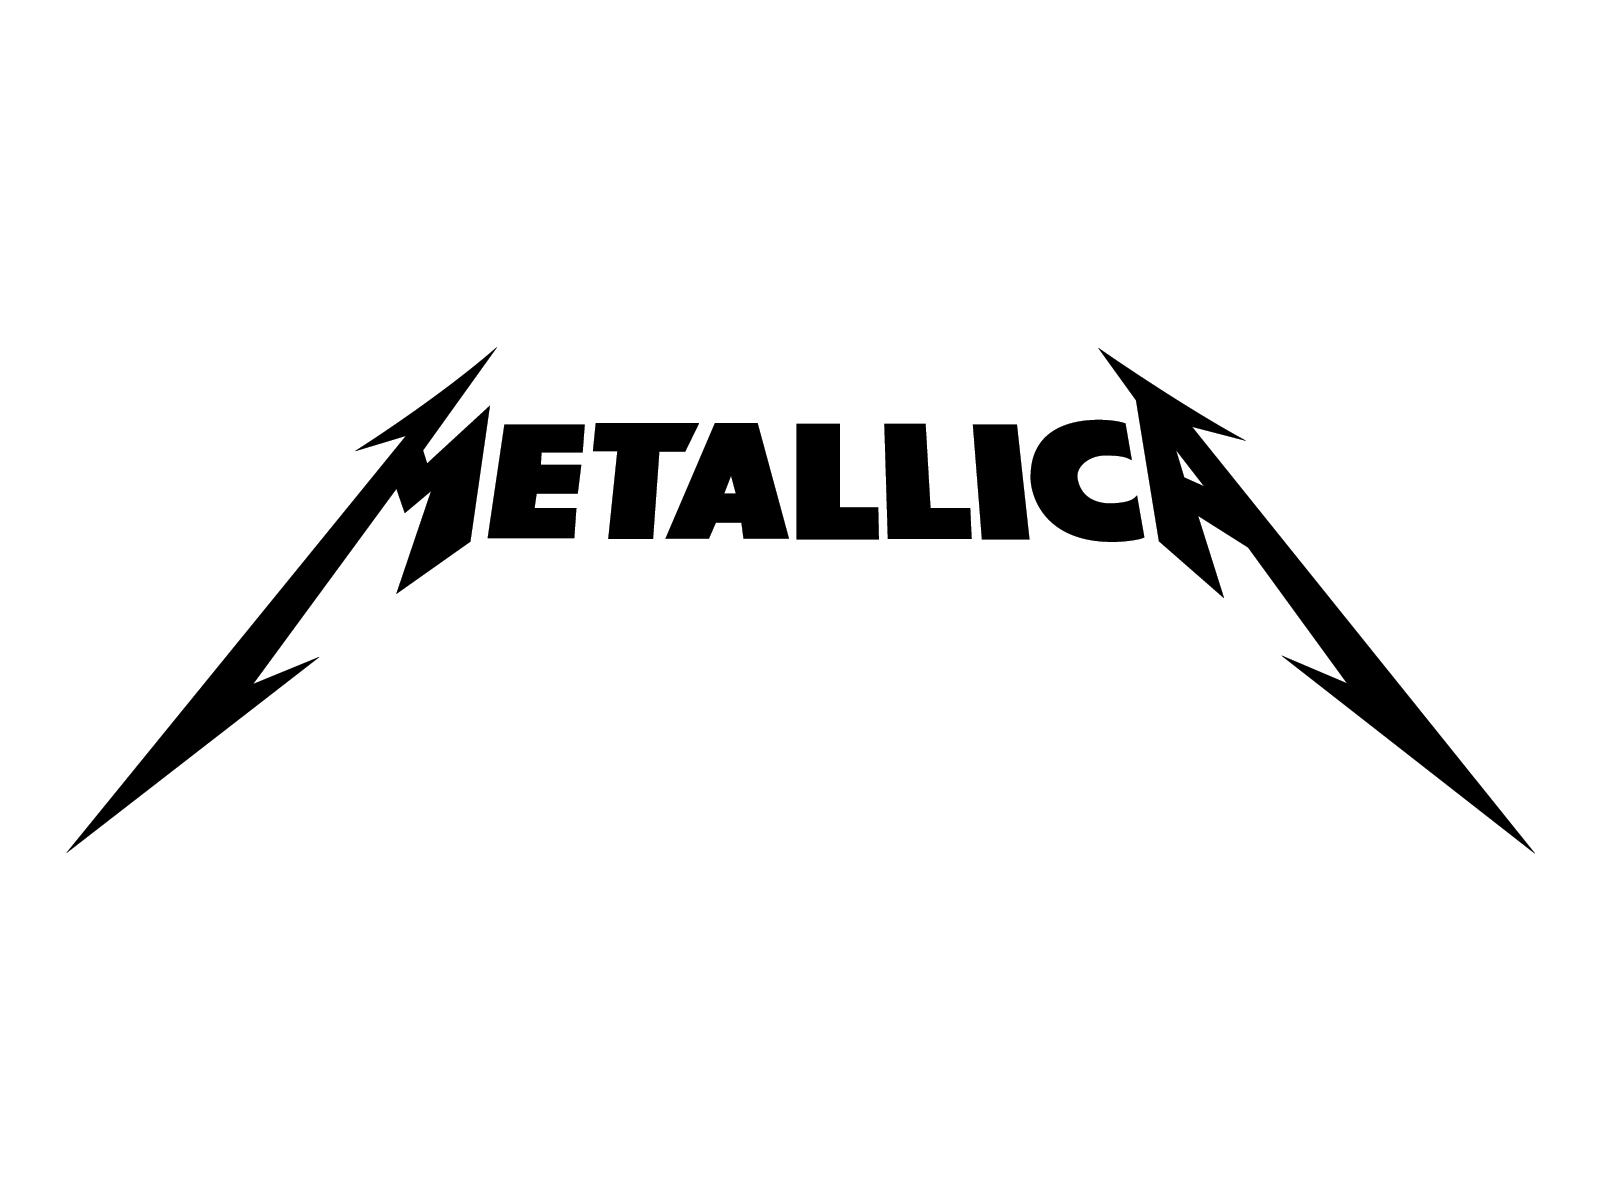 Metallica Clipart-Clipartlook.com-1600-Metallica Clipart-Clipartlook.com-1600-0